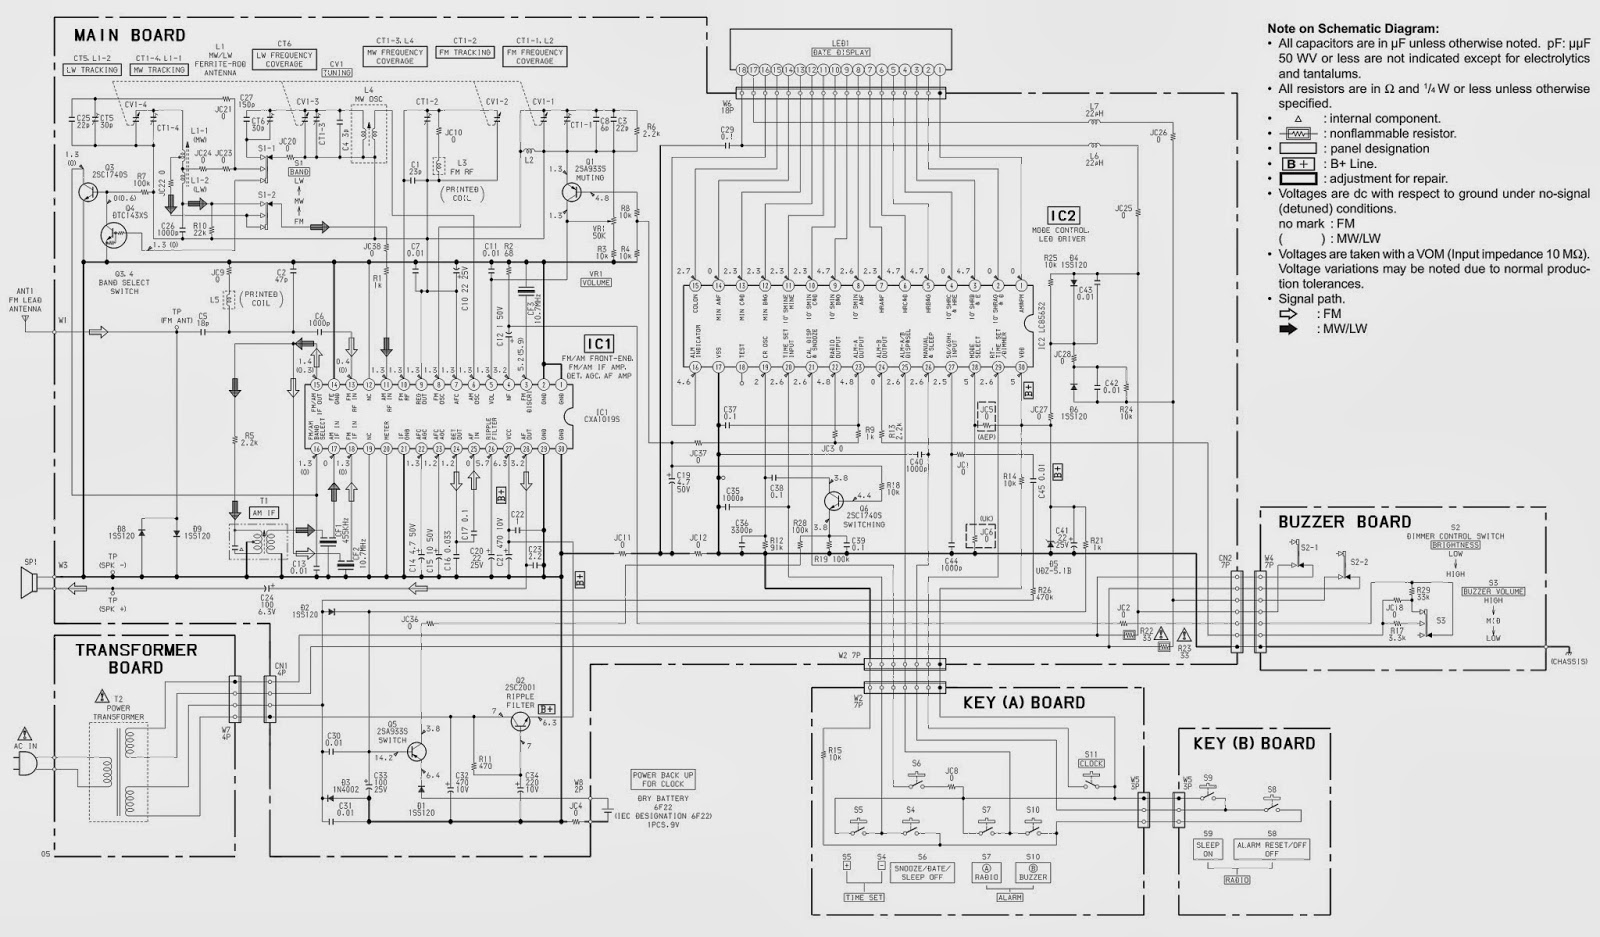 97 honda civic dx fuse box diagram dometic rm2193 wiring 98 hyundai accent radio imageresizertool com